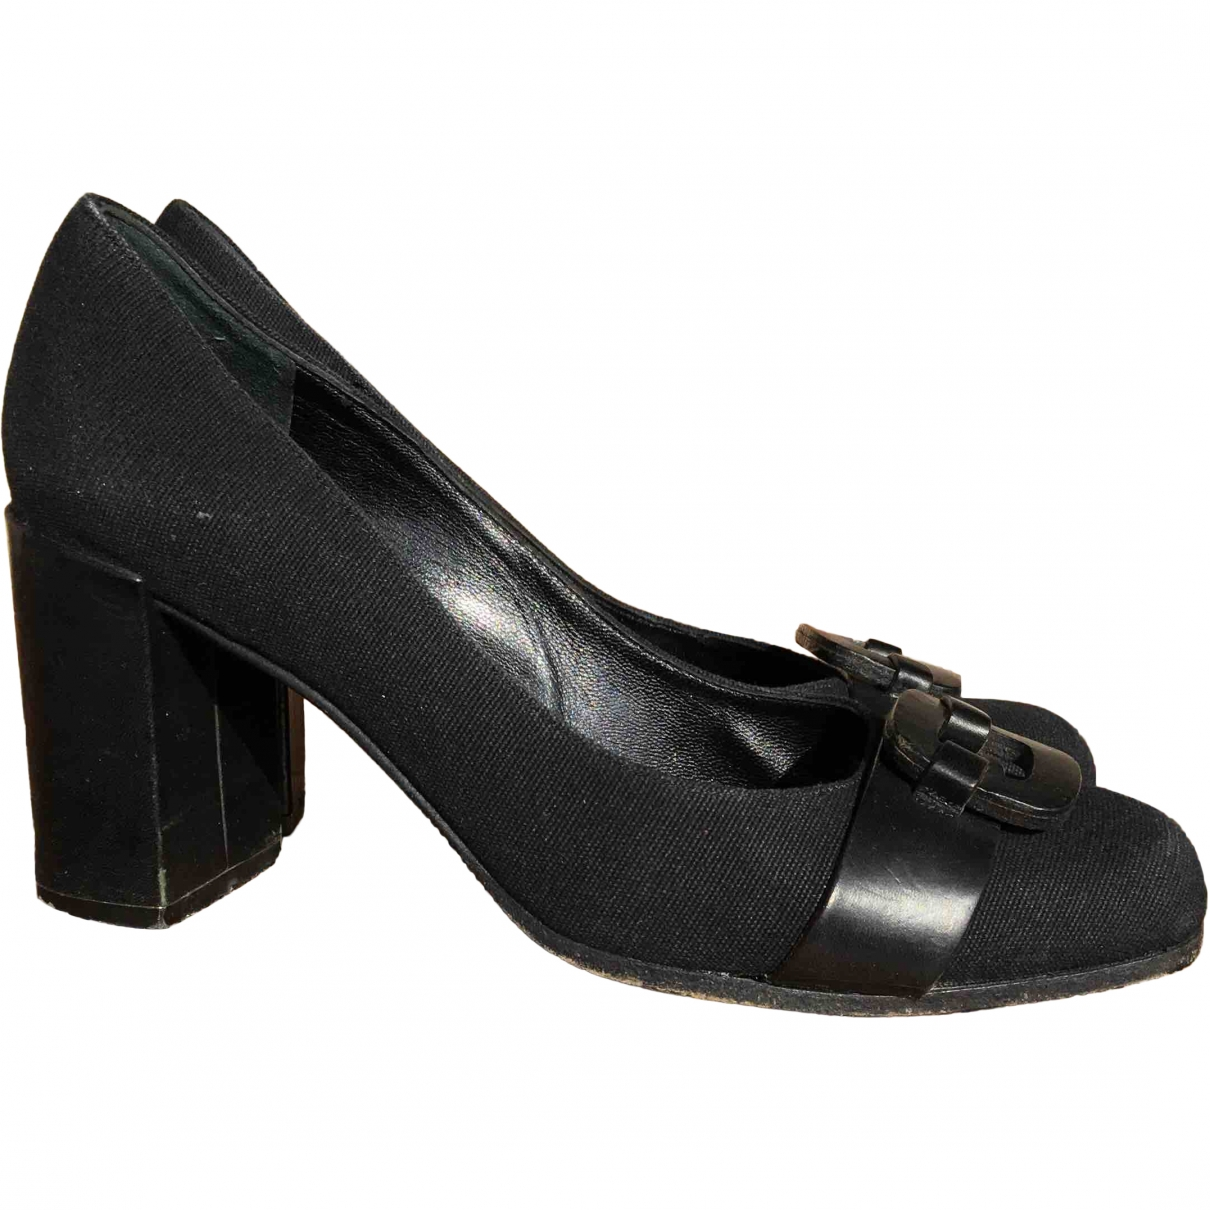 Robert Clergerie \N Black Leather Heels for Women 39 EU